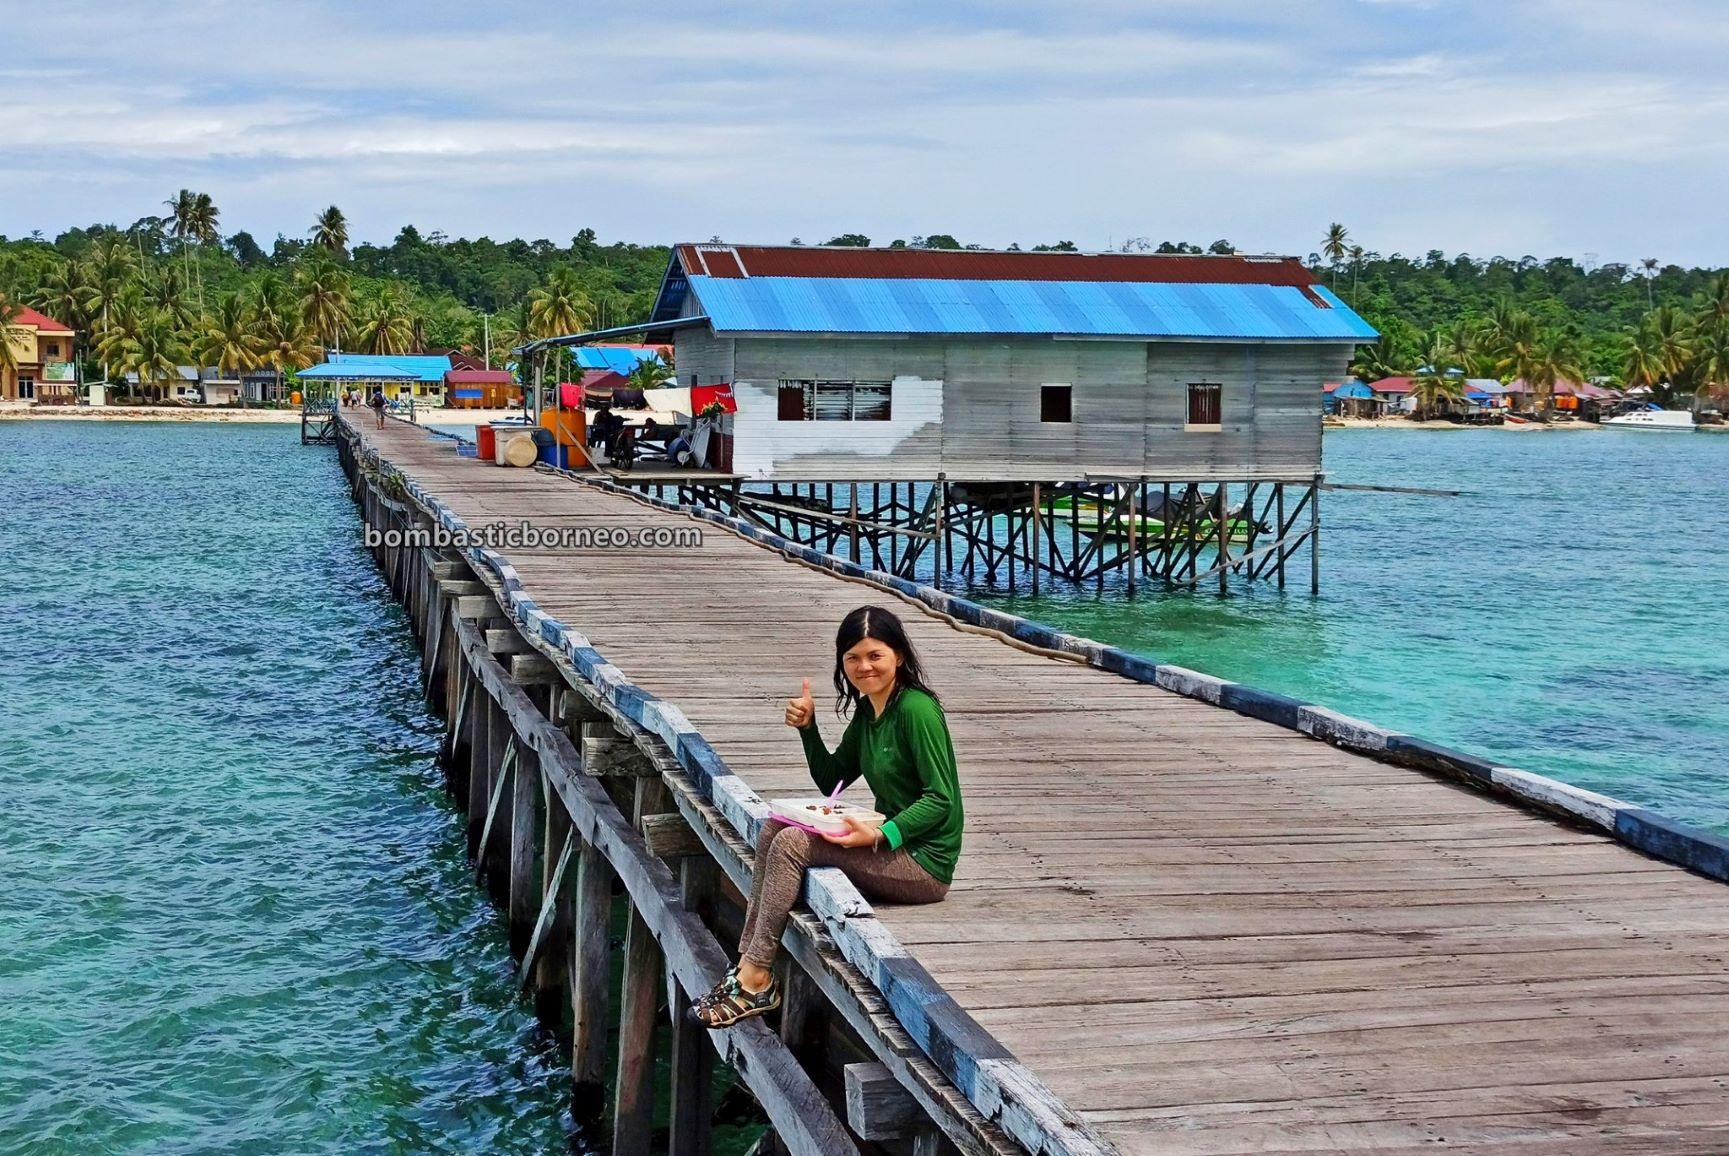 Pulau Maratua, Kampung Payung-Payung, Bajau village, backpackers, Destination, exploration, hidden paradise, holiday, Berau, East Kalimantan, Wonderful Indonesia, objek wisata, travel guide, Trans Border, Borneo,